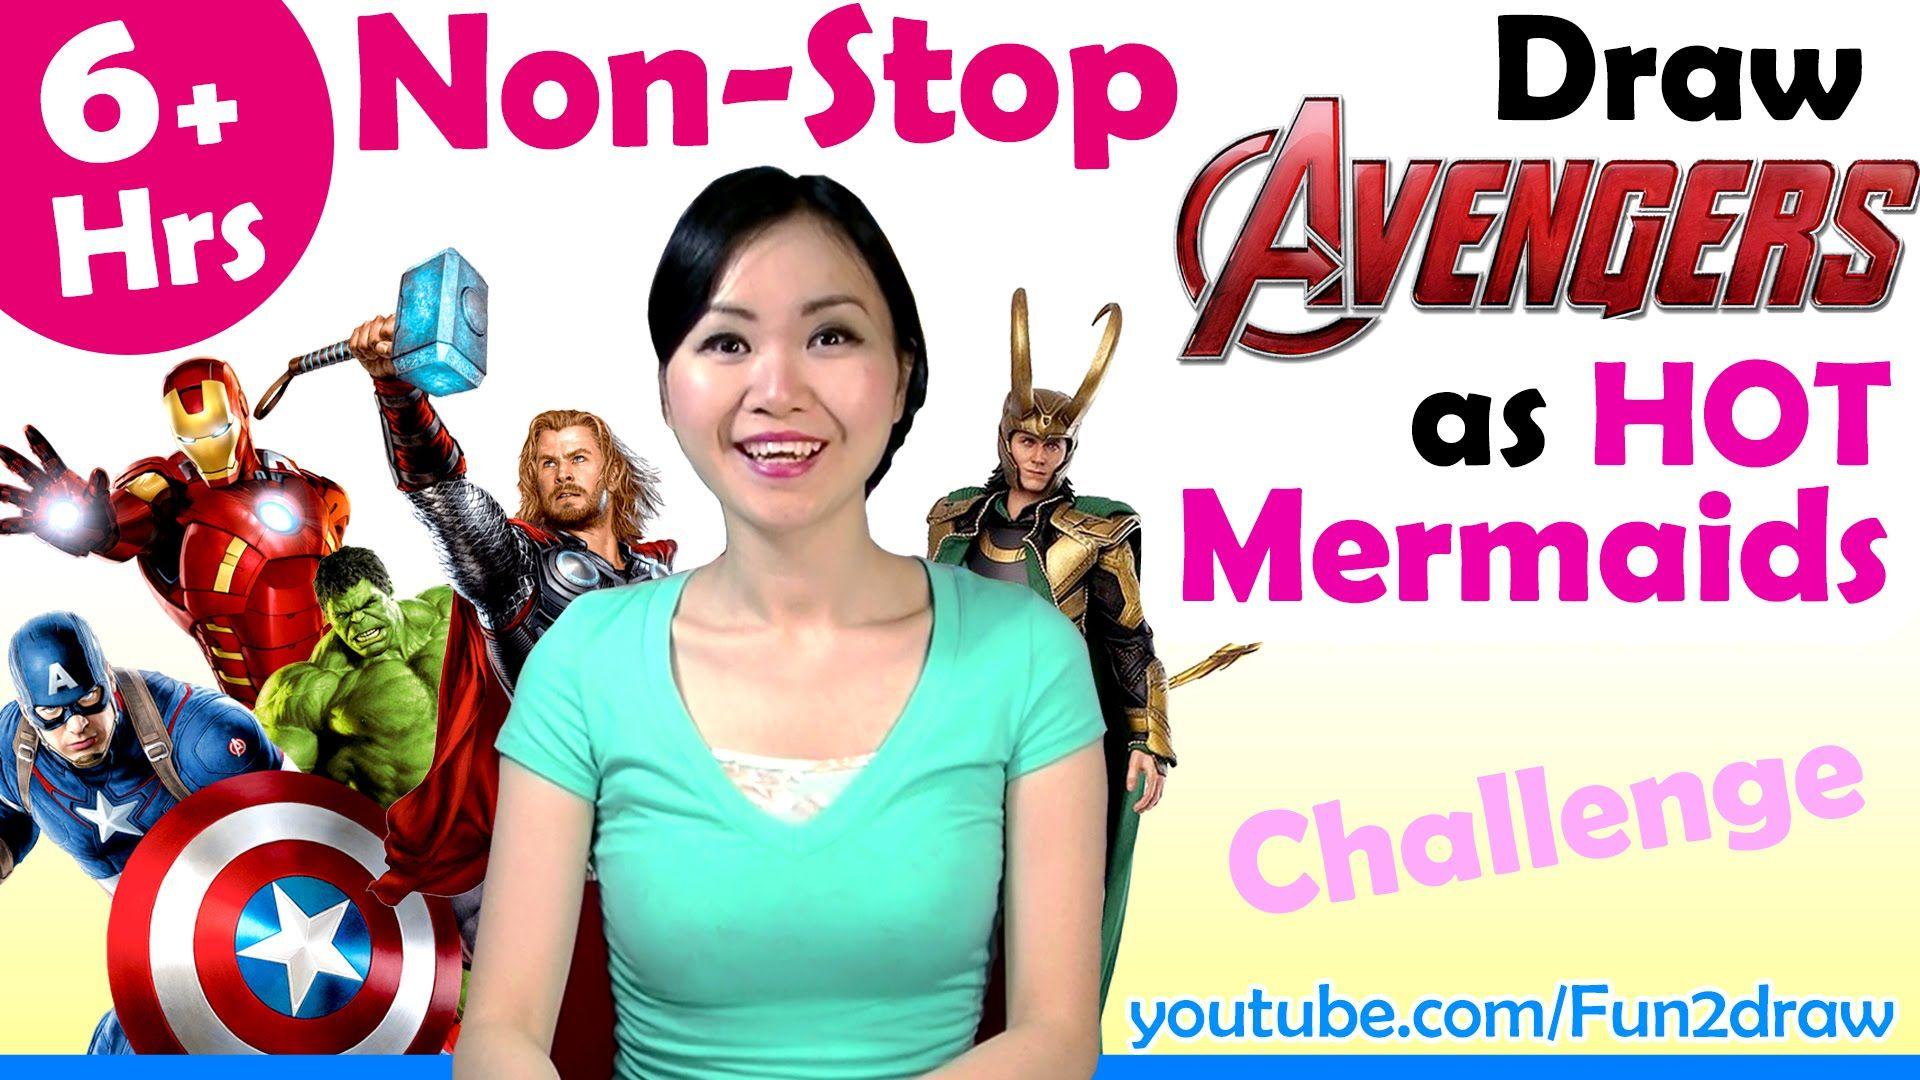 Art Video - Draw Avengers as HOT Mermaids - 6+ Hours Nonstop Challenge